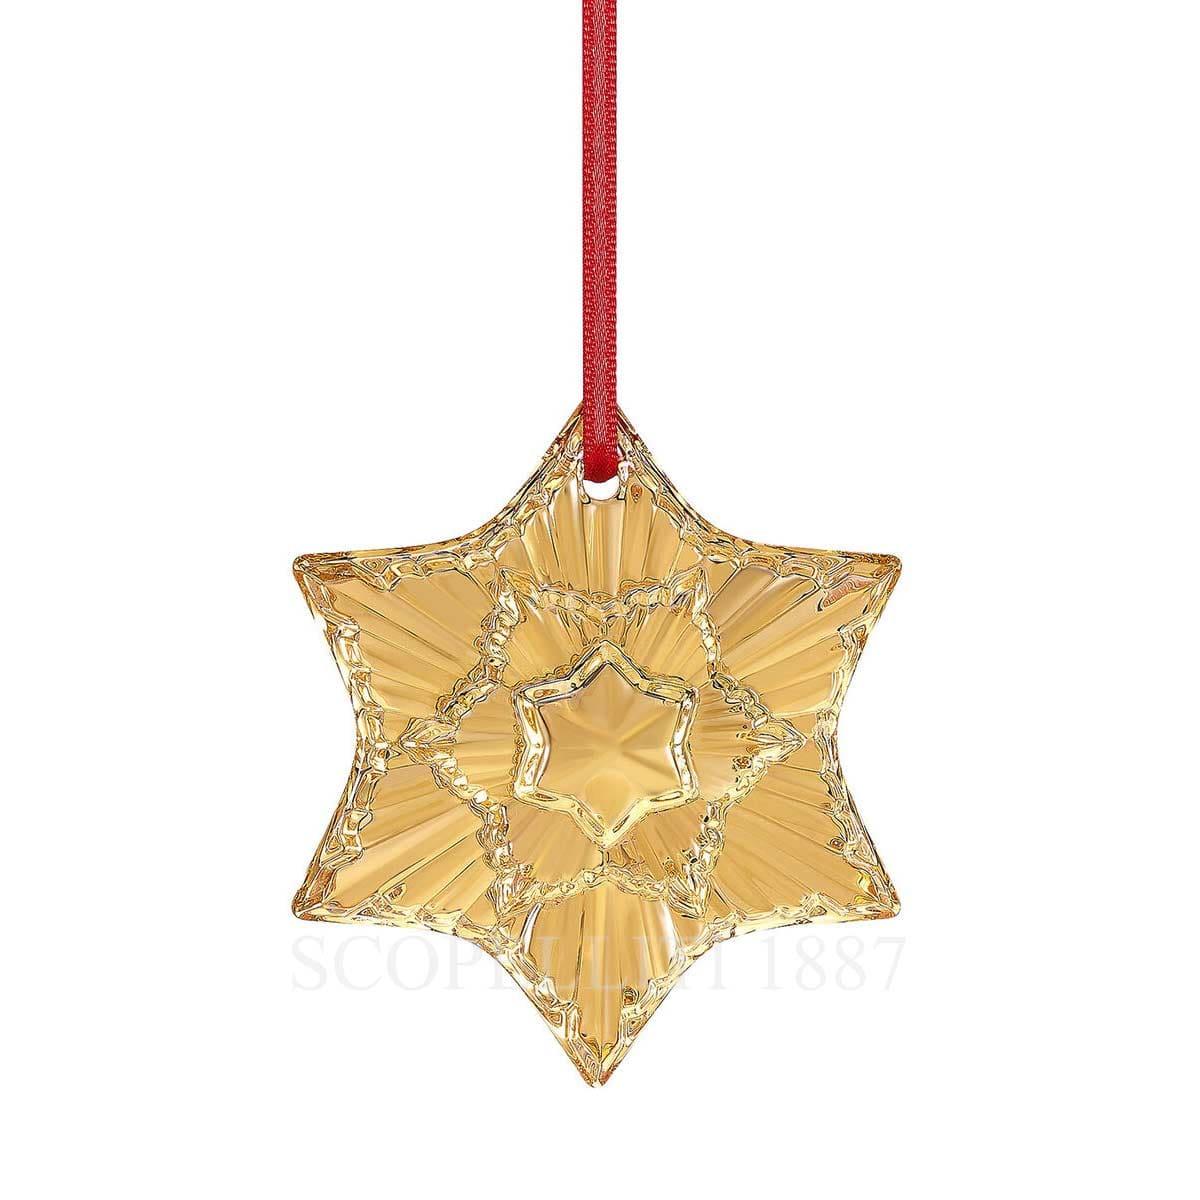 Baccarat 2020 Christmas Ornament Baccarat Annual Ornament 2020 Gold   SCOPELLITI 1887